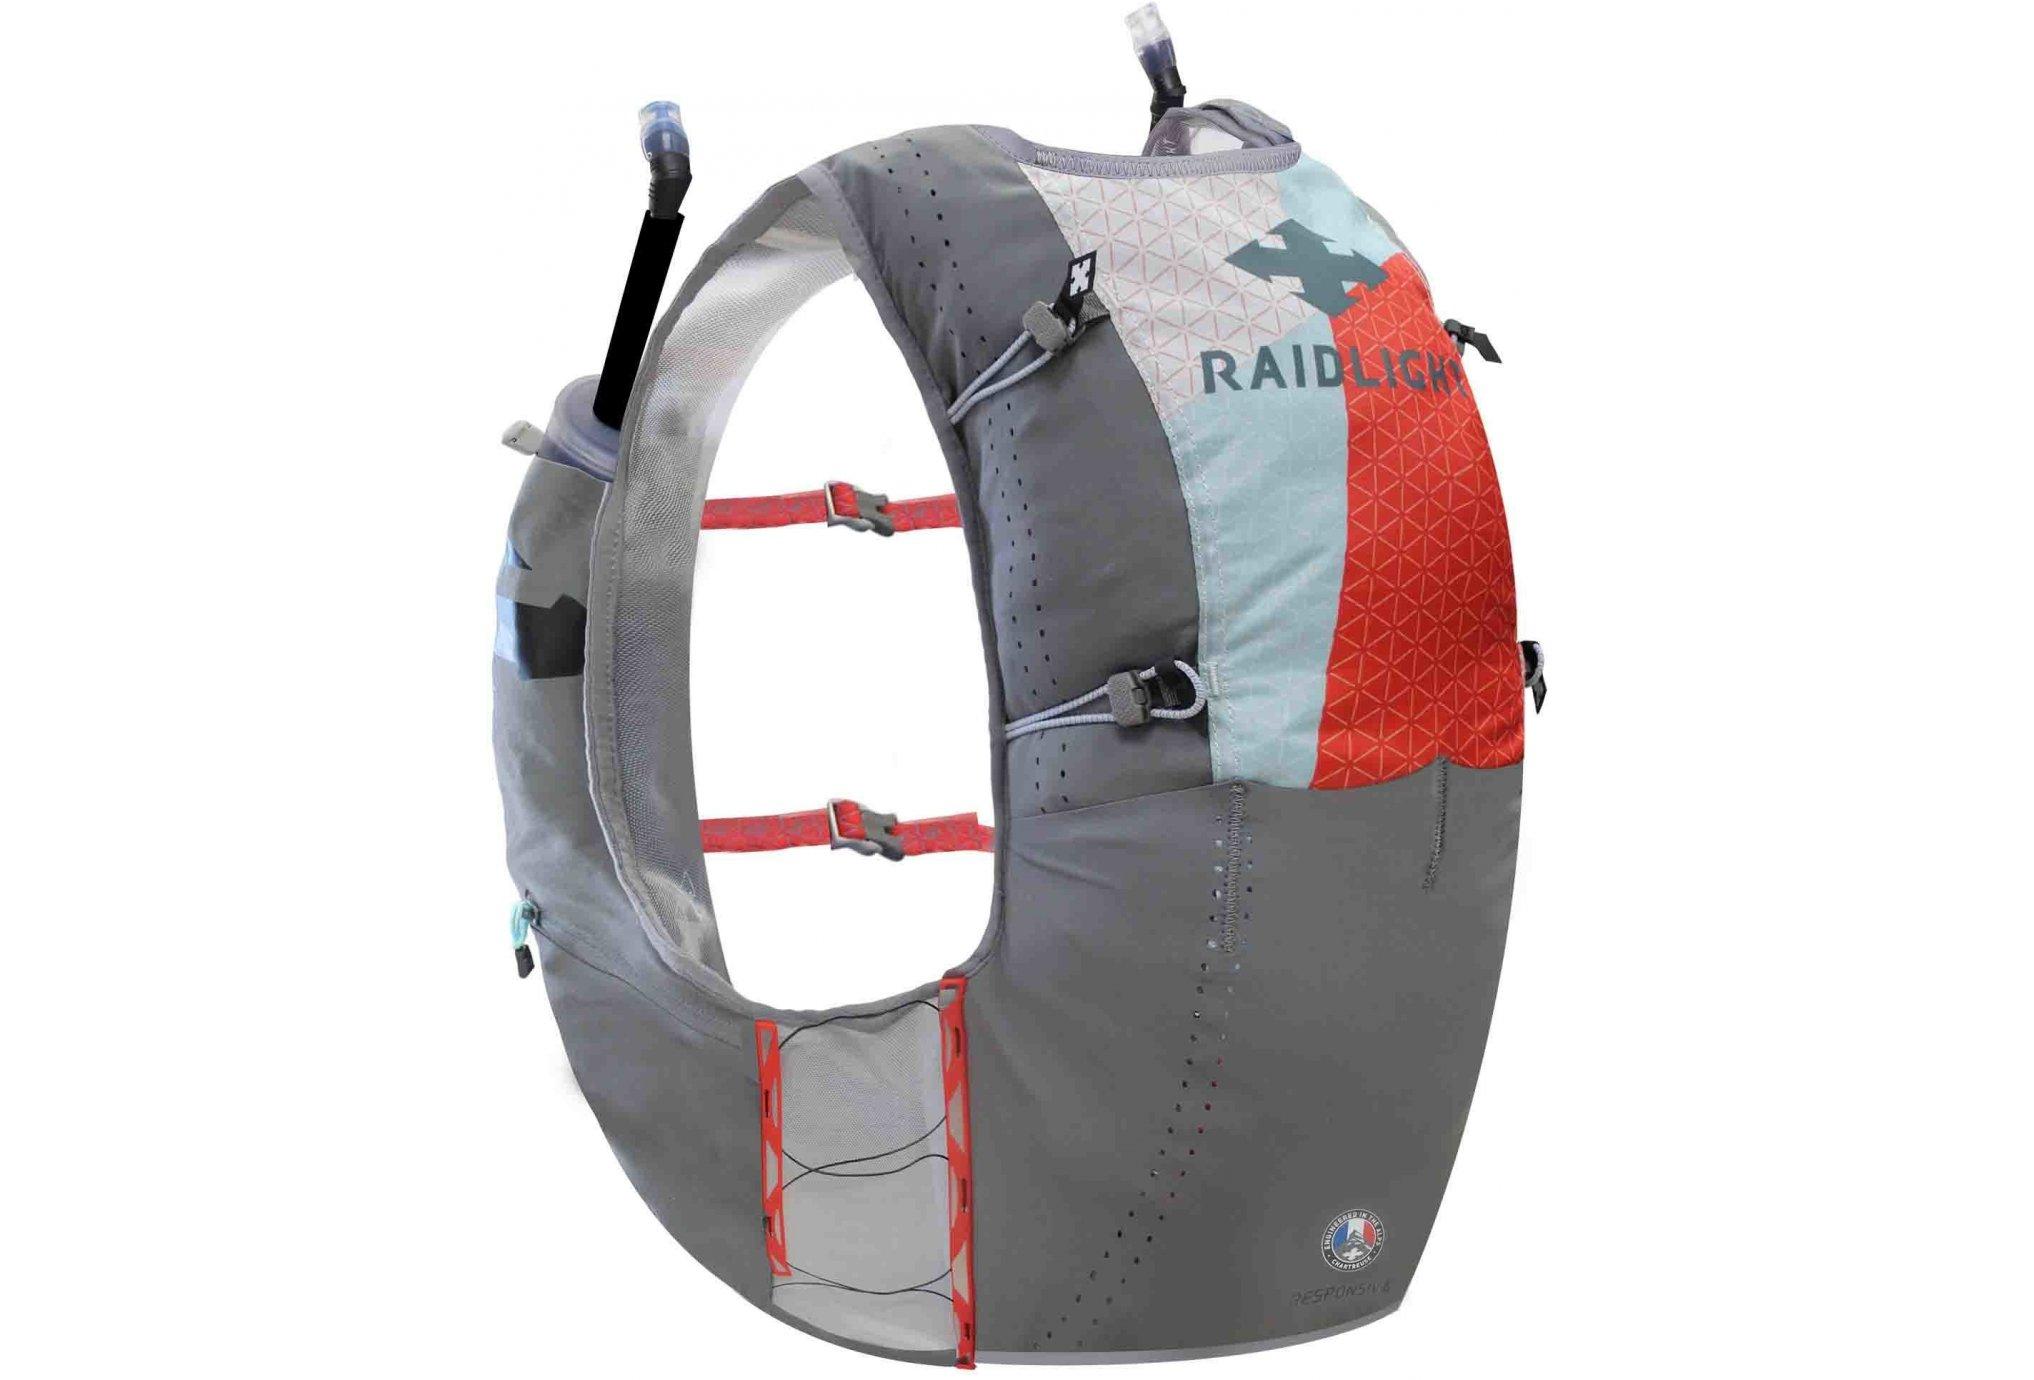 Raidlight Responsiv Vest 6L + 2 EazyFlask 600 mL M Sac hydratation / Gourde